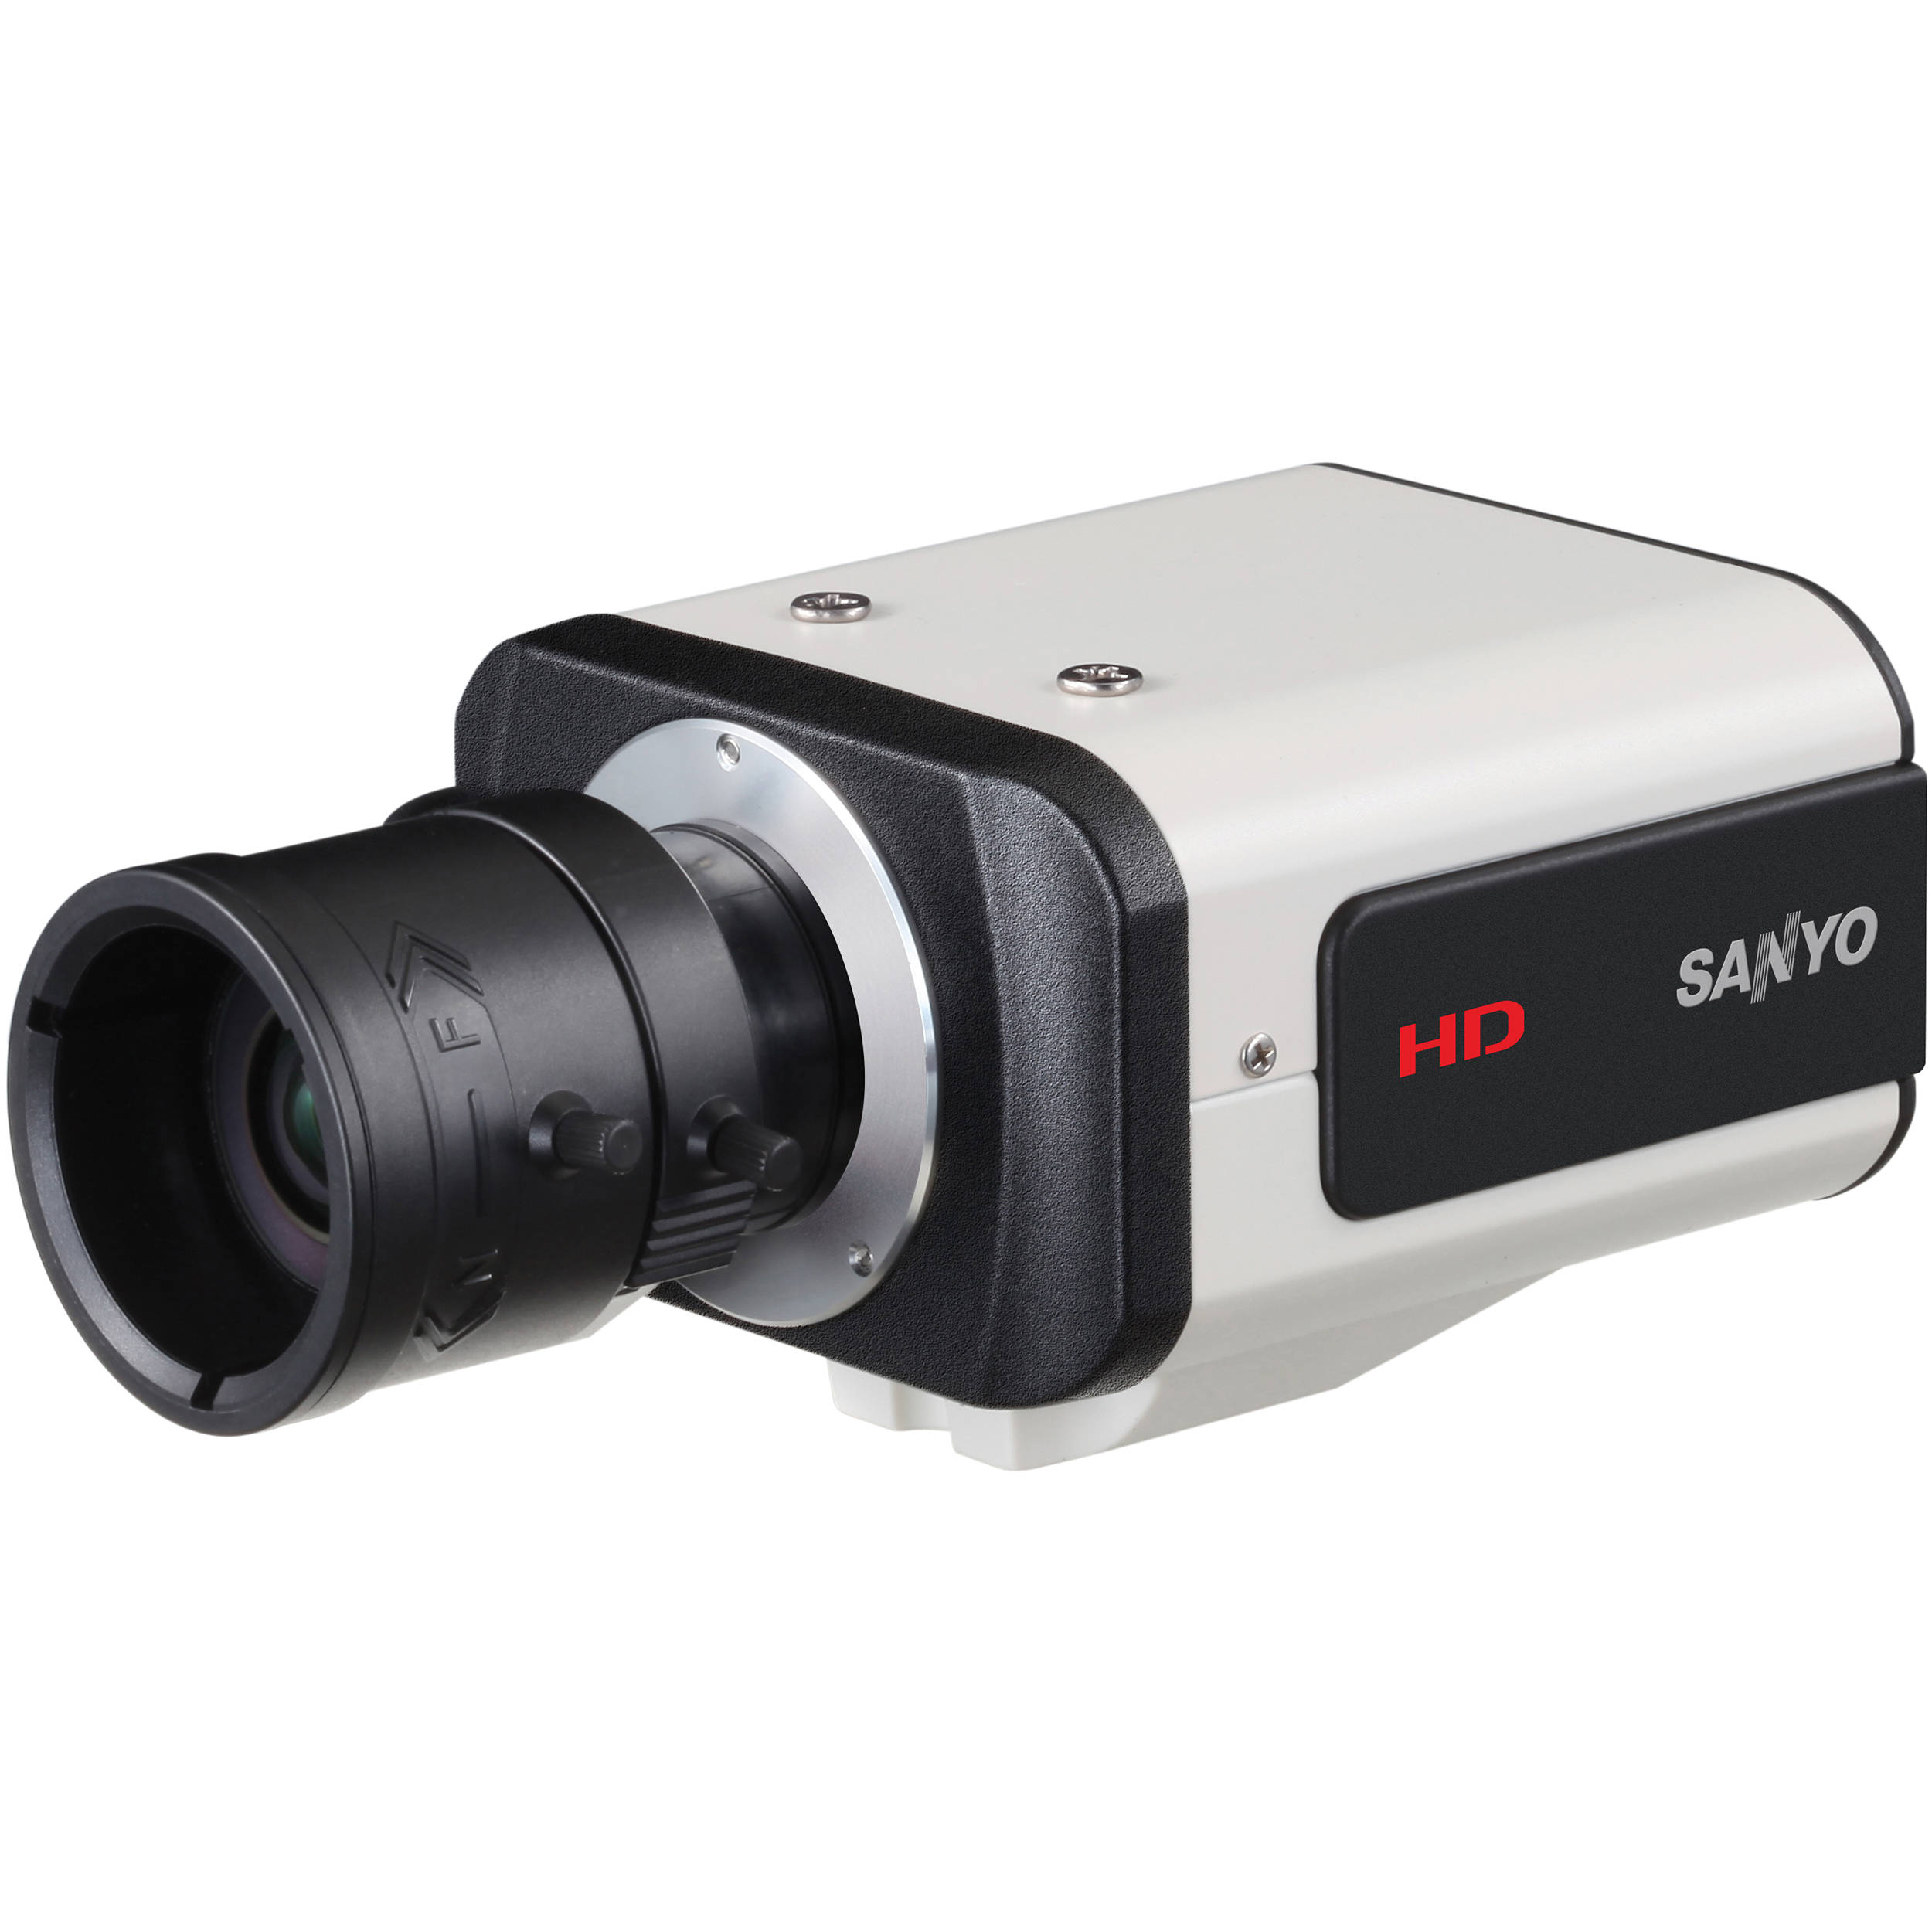 Sanyo Cameras: Digital Photography Review